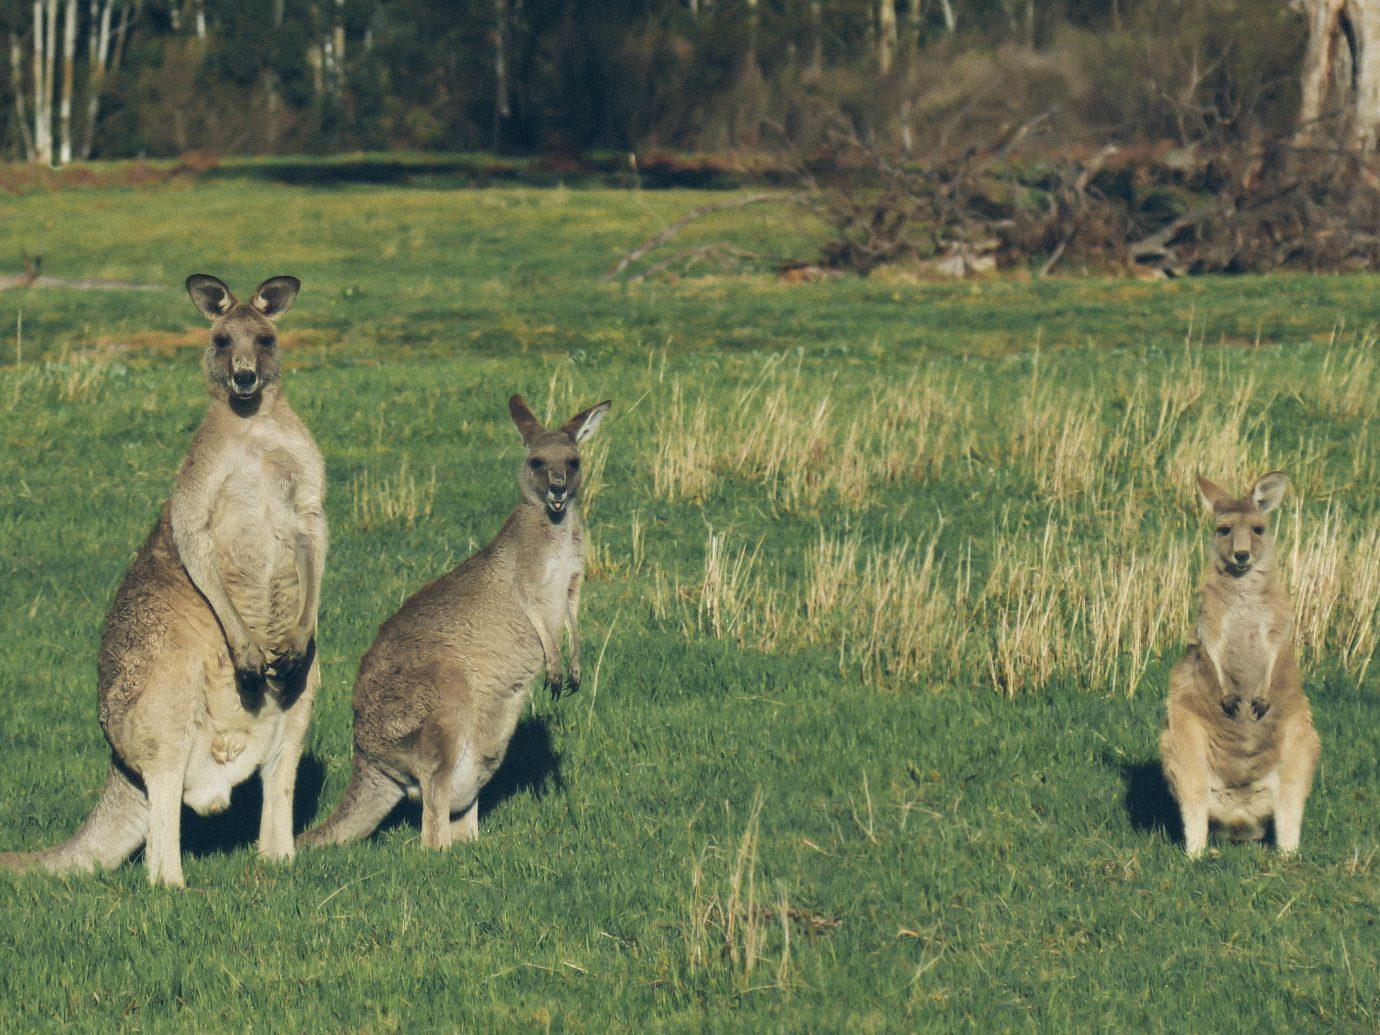 Trip Ideas grass animal outdoor field kangaroo mammal Wildlife fauna marsupial macropodidae grassland prairie white tailed deer savanna grassy